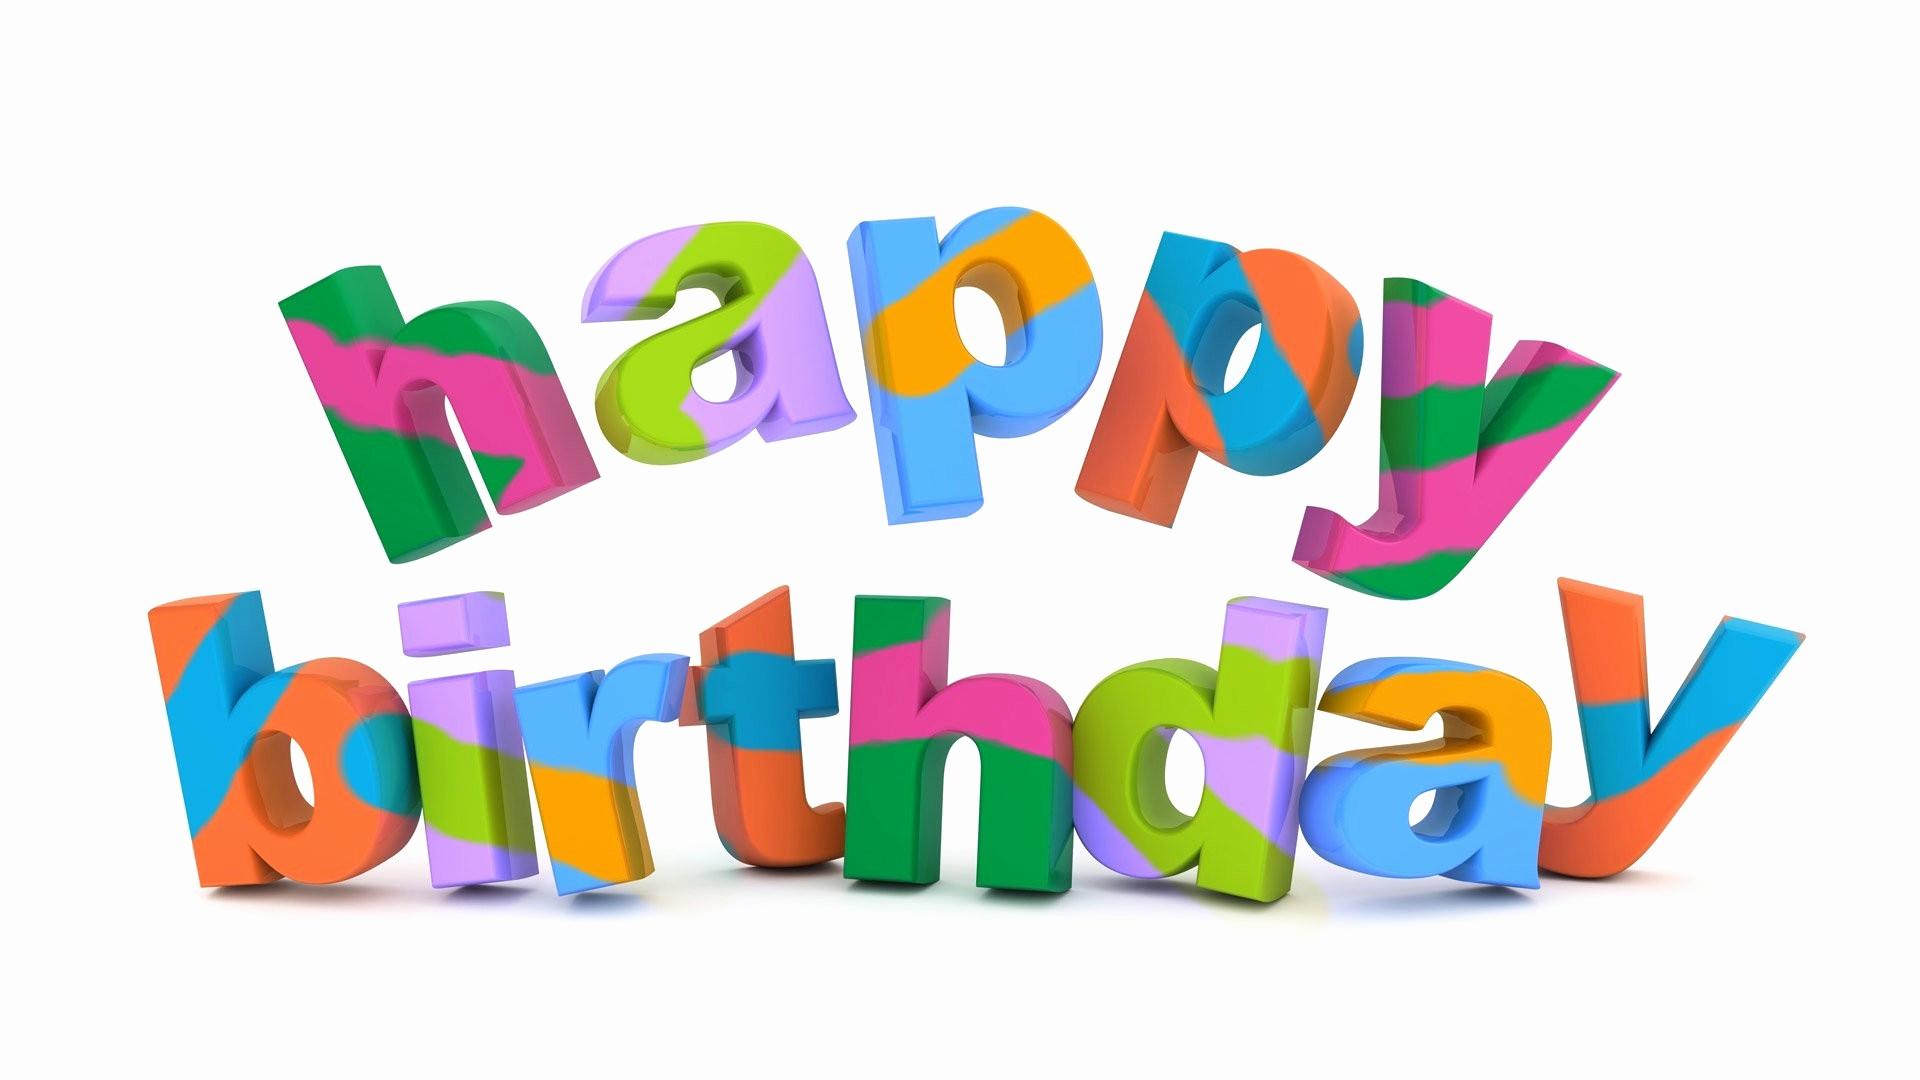 Happy Bday Wallpapers Free Best Of Happy Birthday Wallpaper Hd